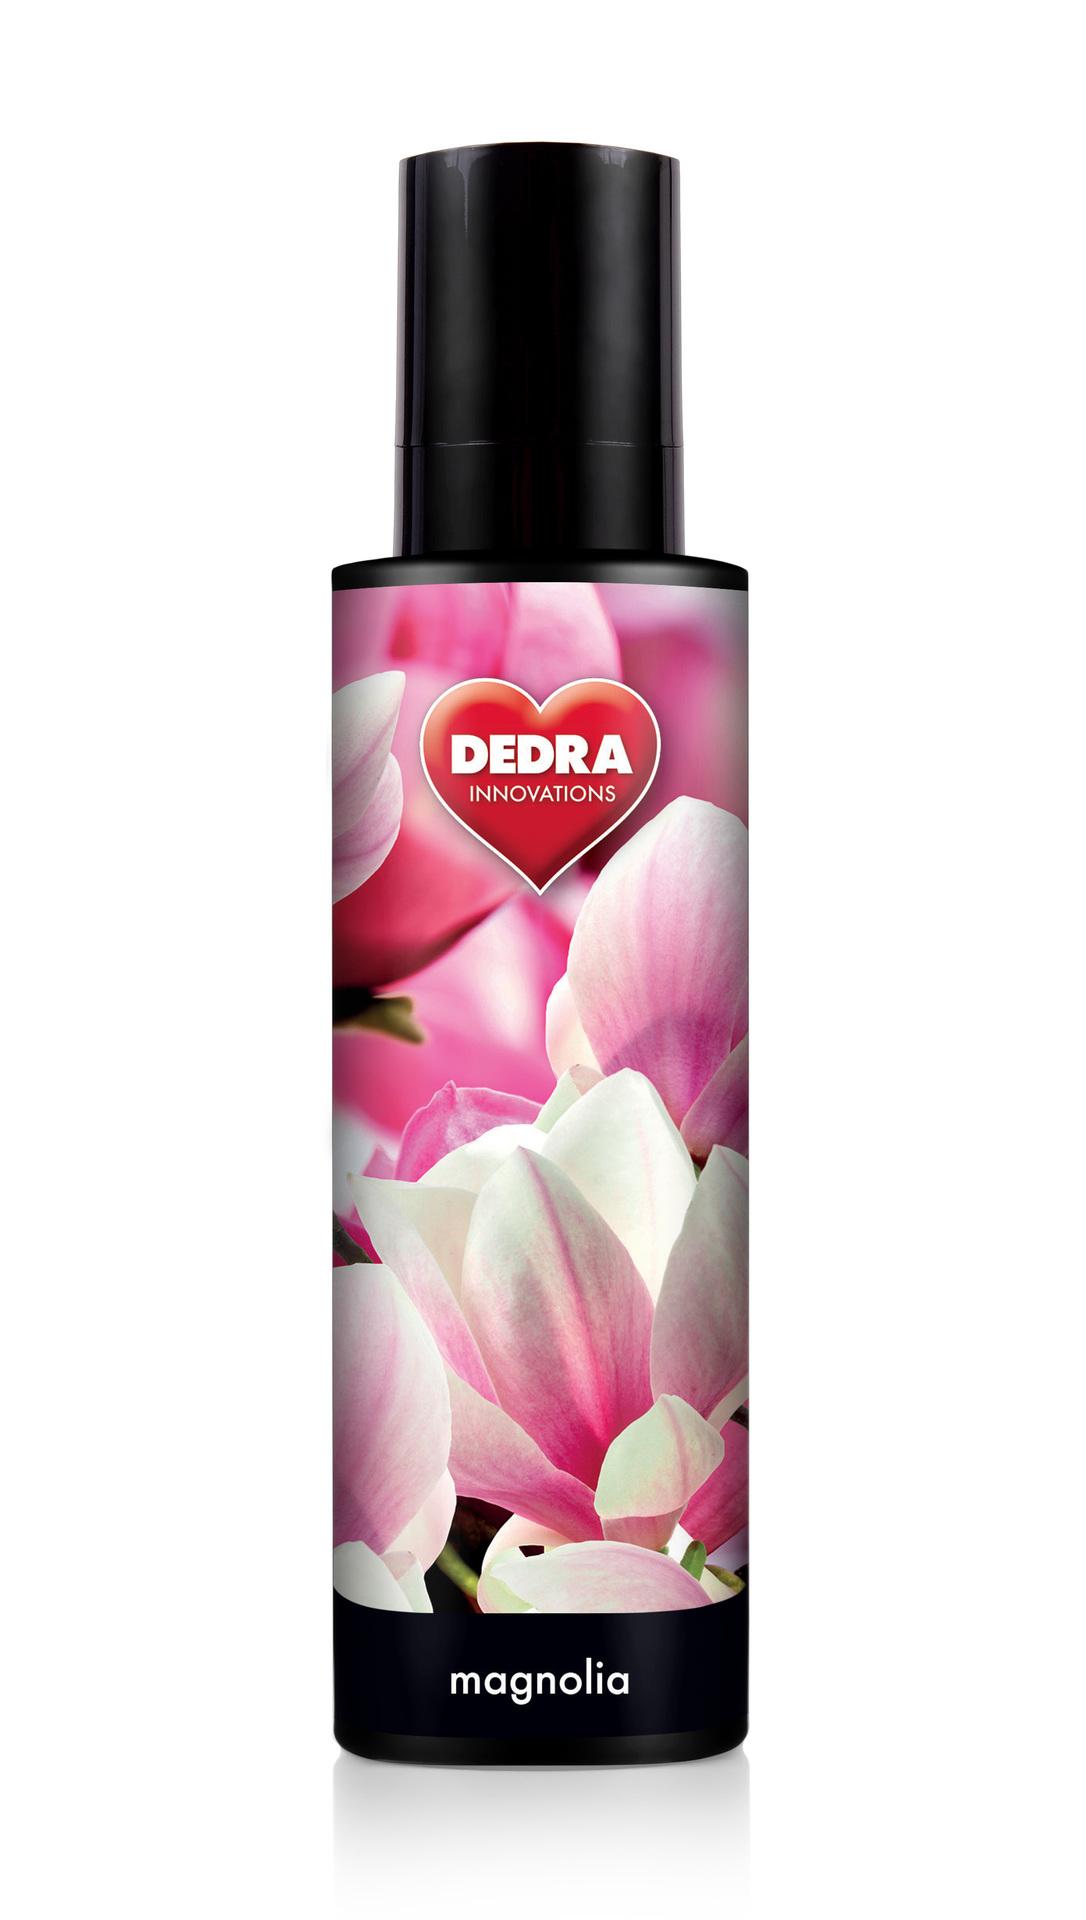 https://dedra.blob.core.windows.net/cms/ContentItems/21292_parfum-airatextiles-magnolia-osvezovac-vzduchu-a-textilii/images/hp0479-04-2019.jpg